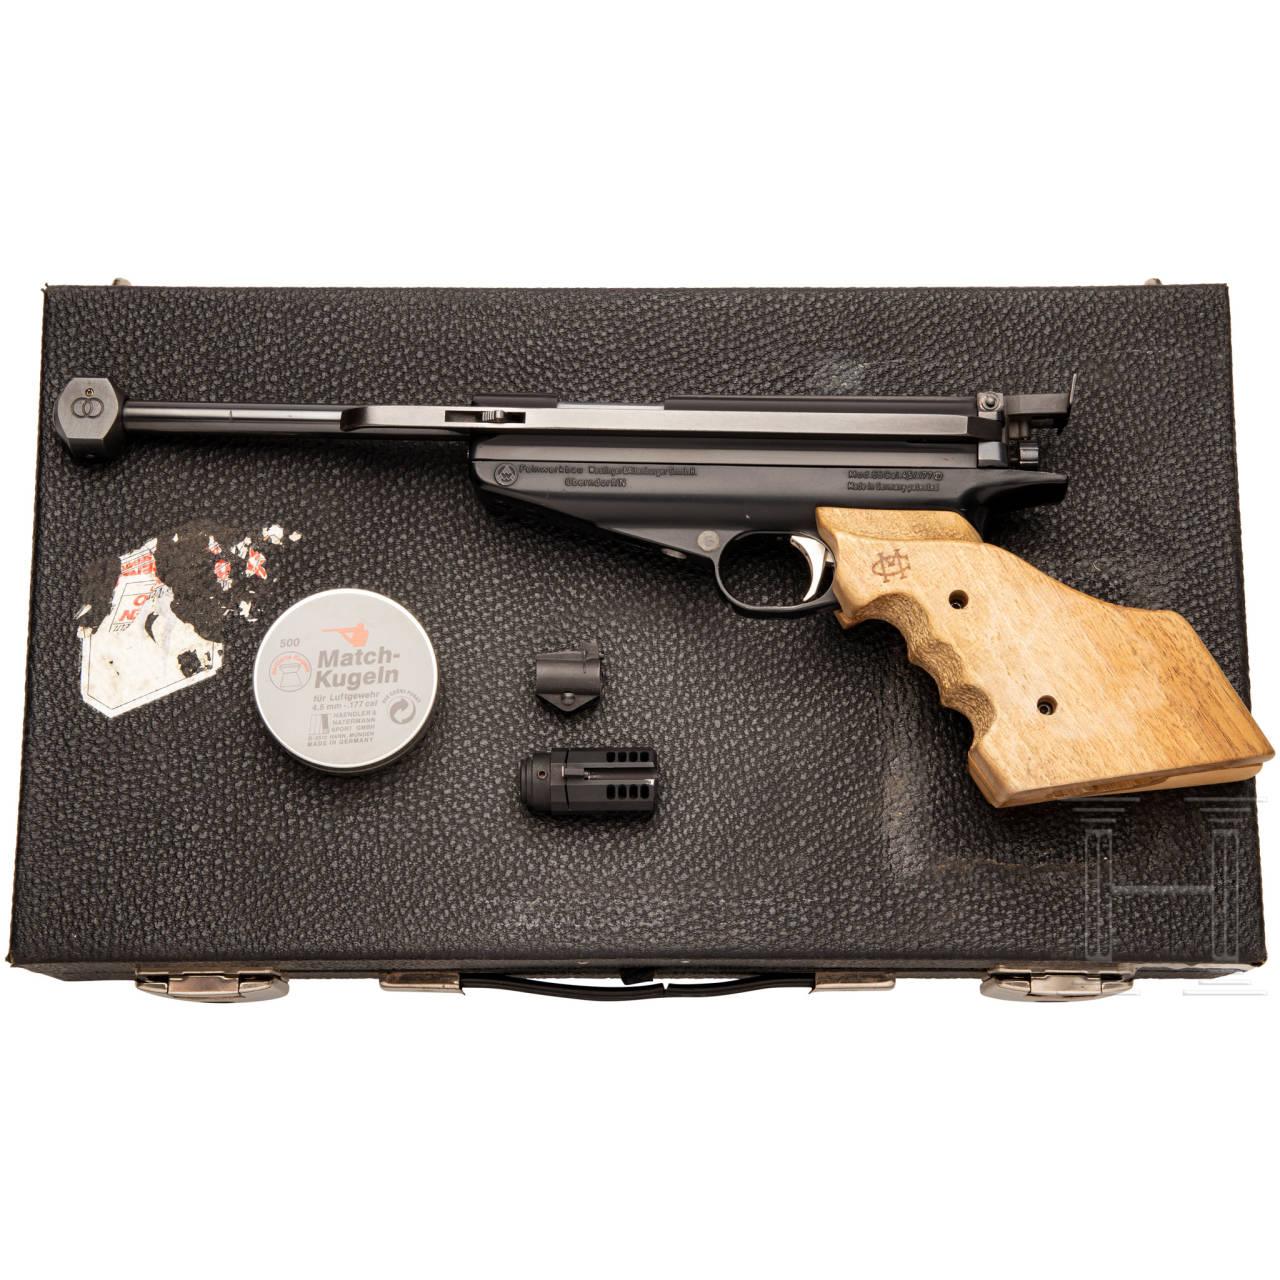 Luftpistole Feinwerkbau Mod. 65, im Koffer